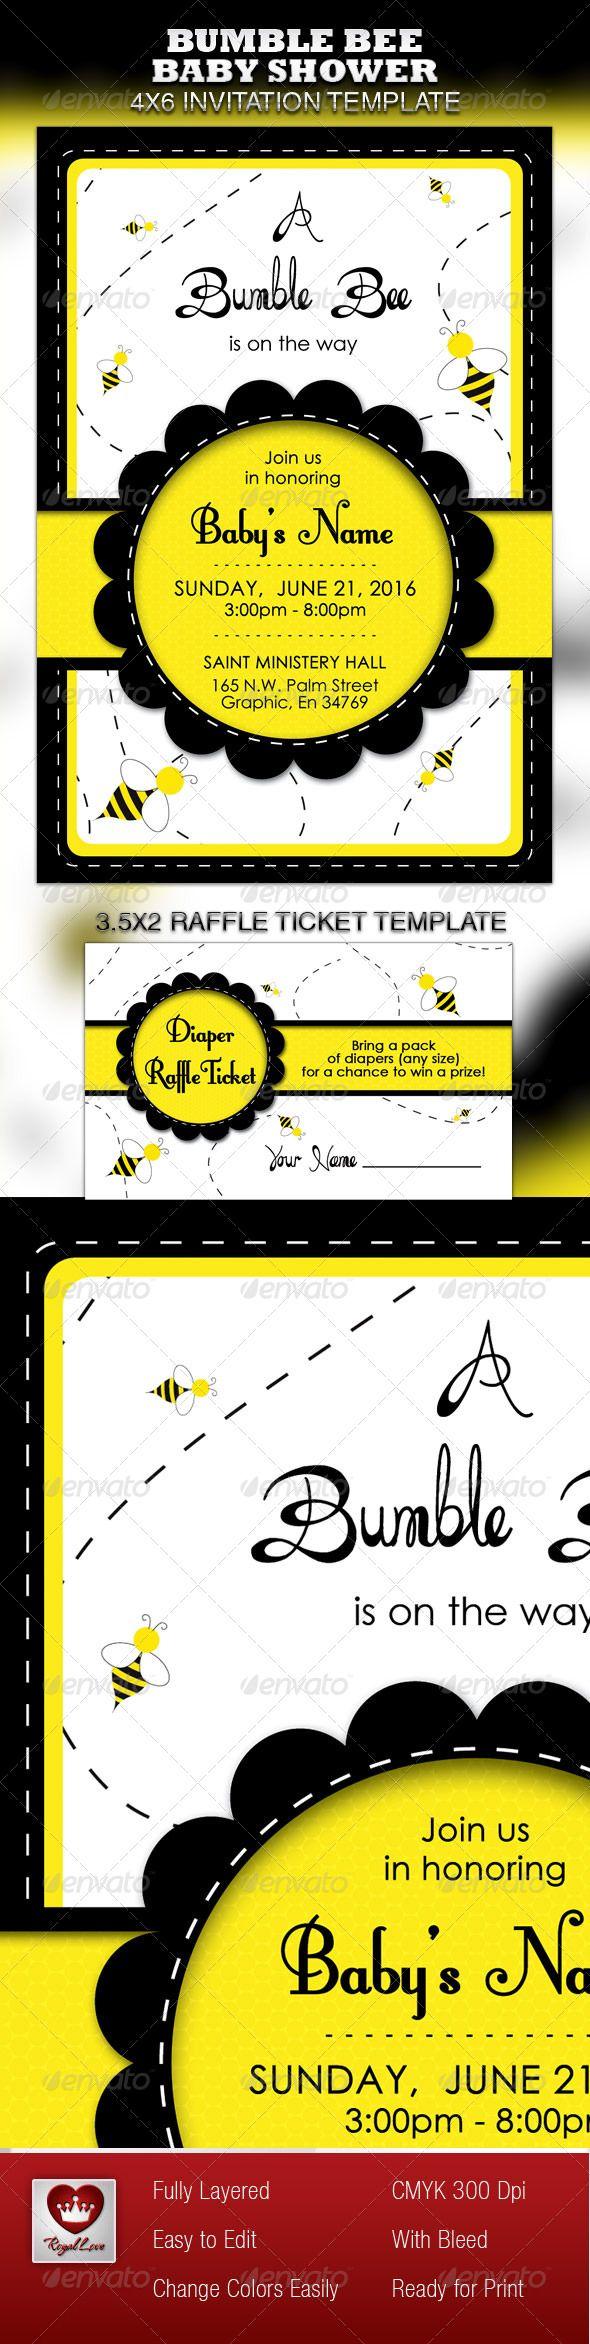 Bumble Bee Baby Shower Invitation & Raffle Ticket | Raffle tickets ...